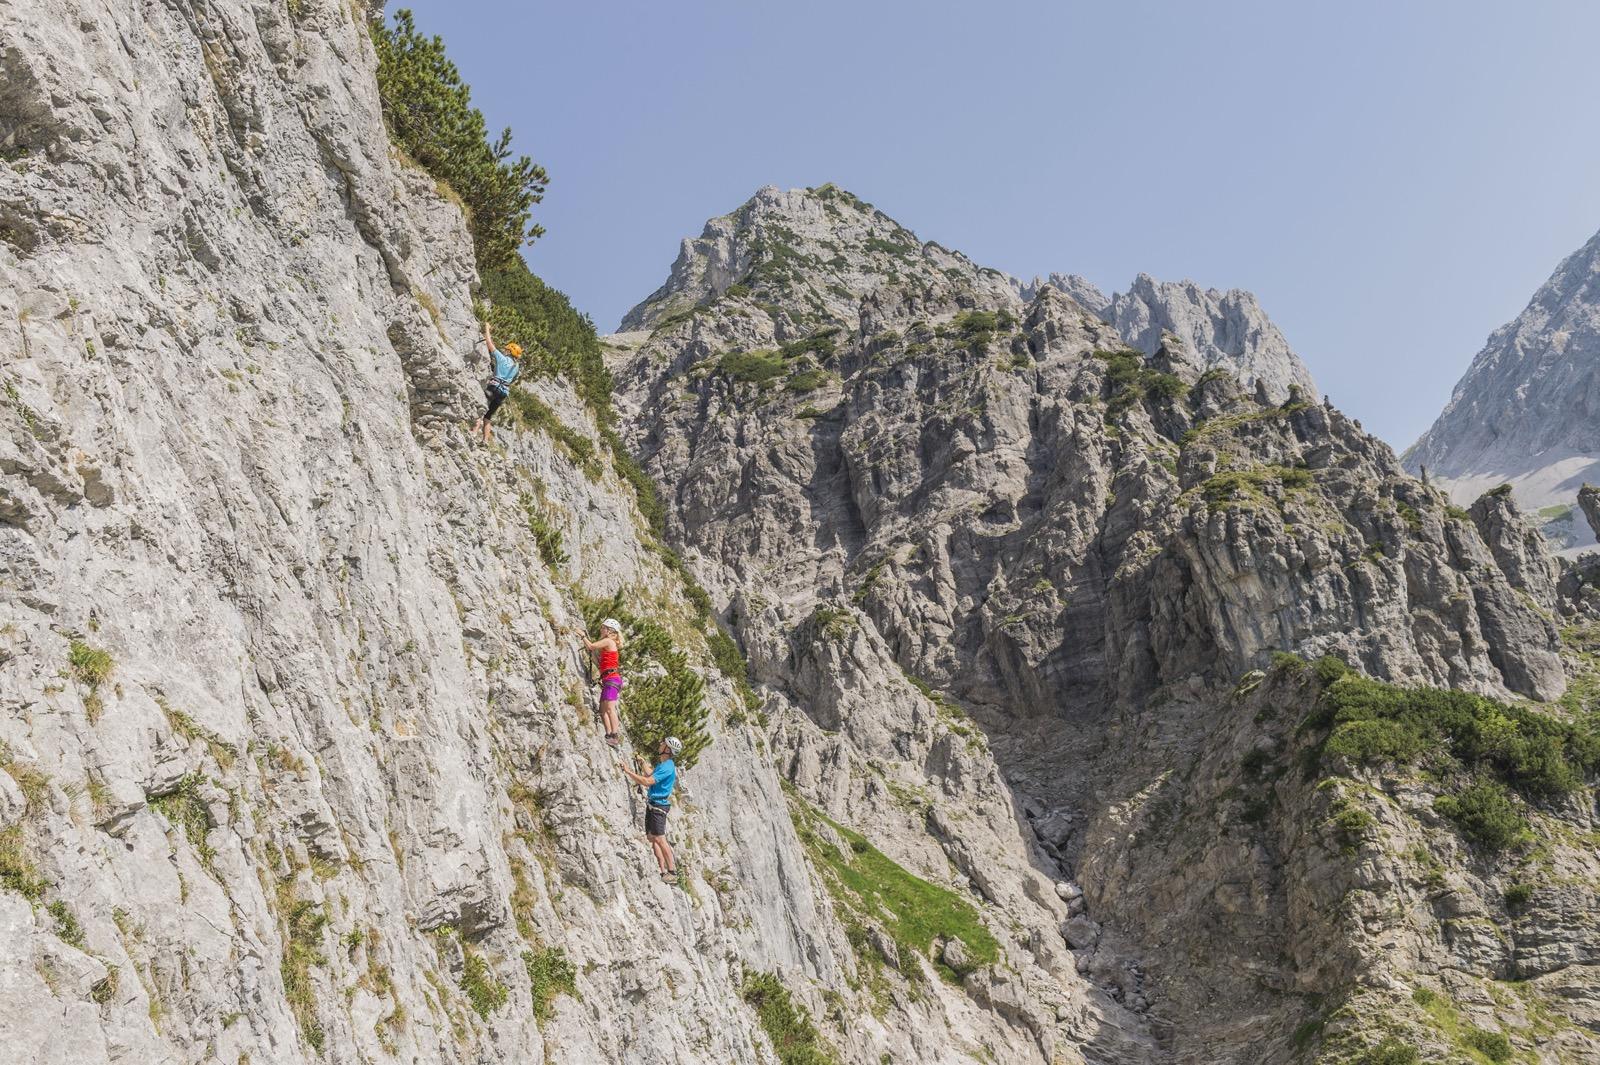 Klettersteig Klamm, Wilder Kaiser, Foto Peter von Feldbert I Climbers Paradise